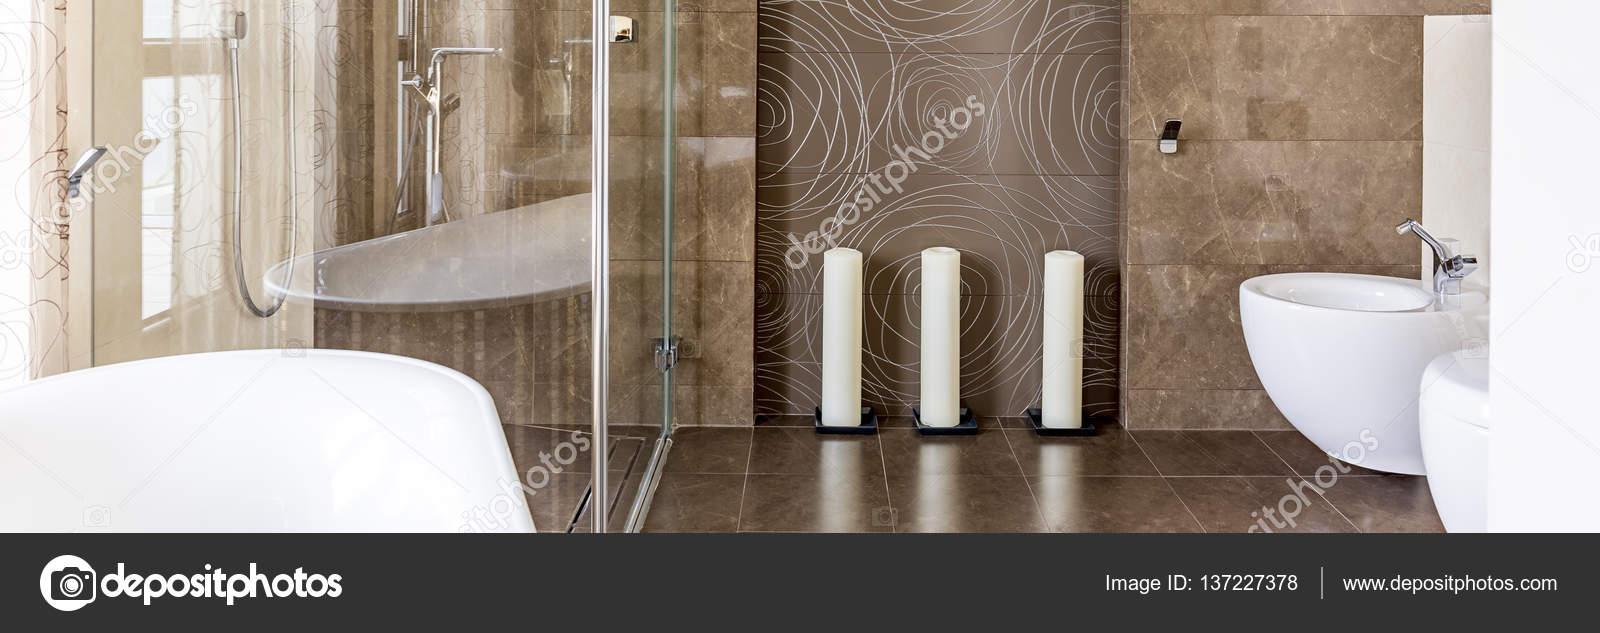 Badezimmer mit begehbarer Dusche — Stockfoto © photographee.eu ...